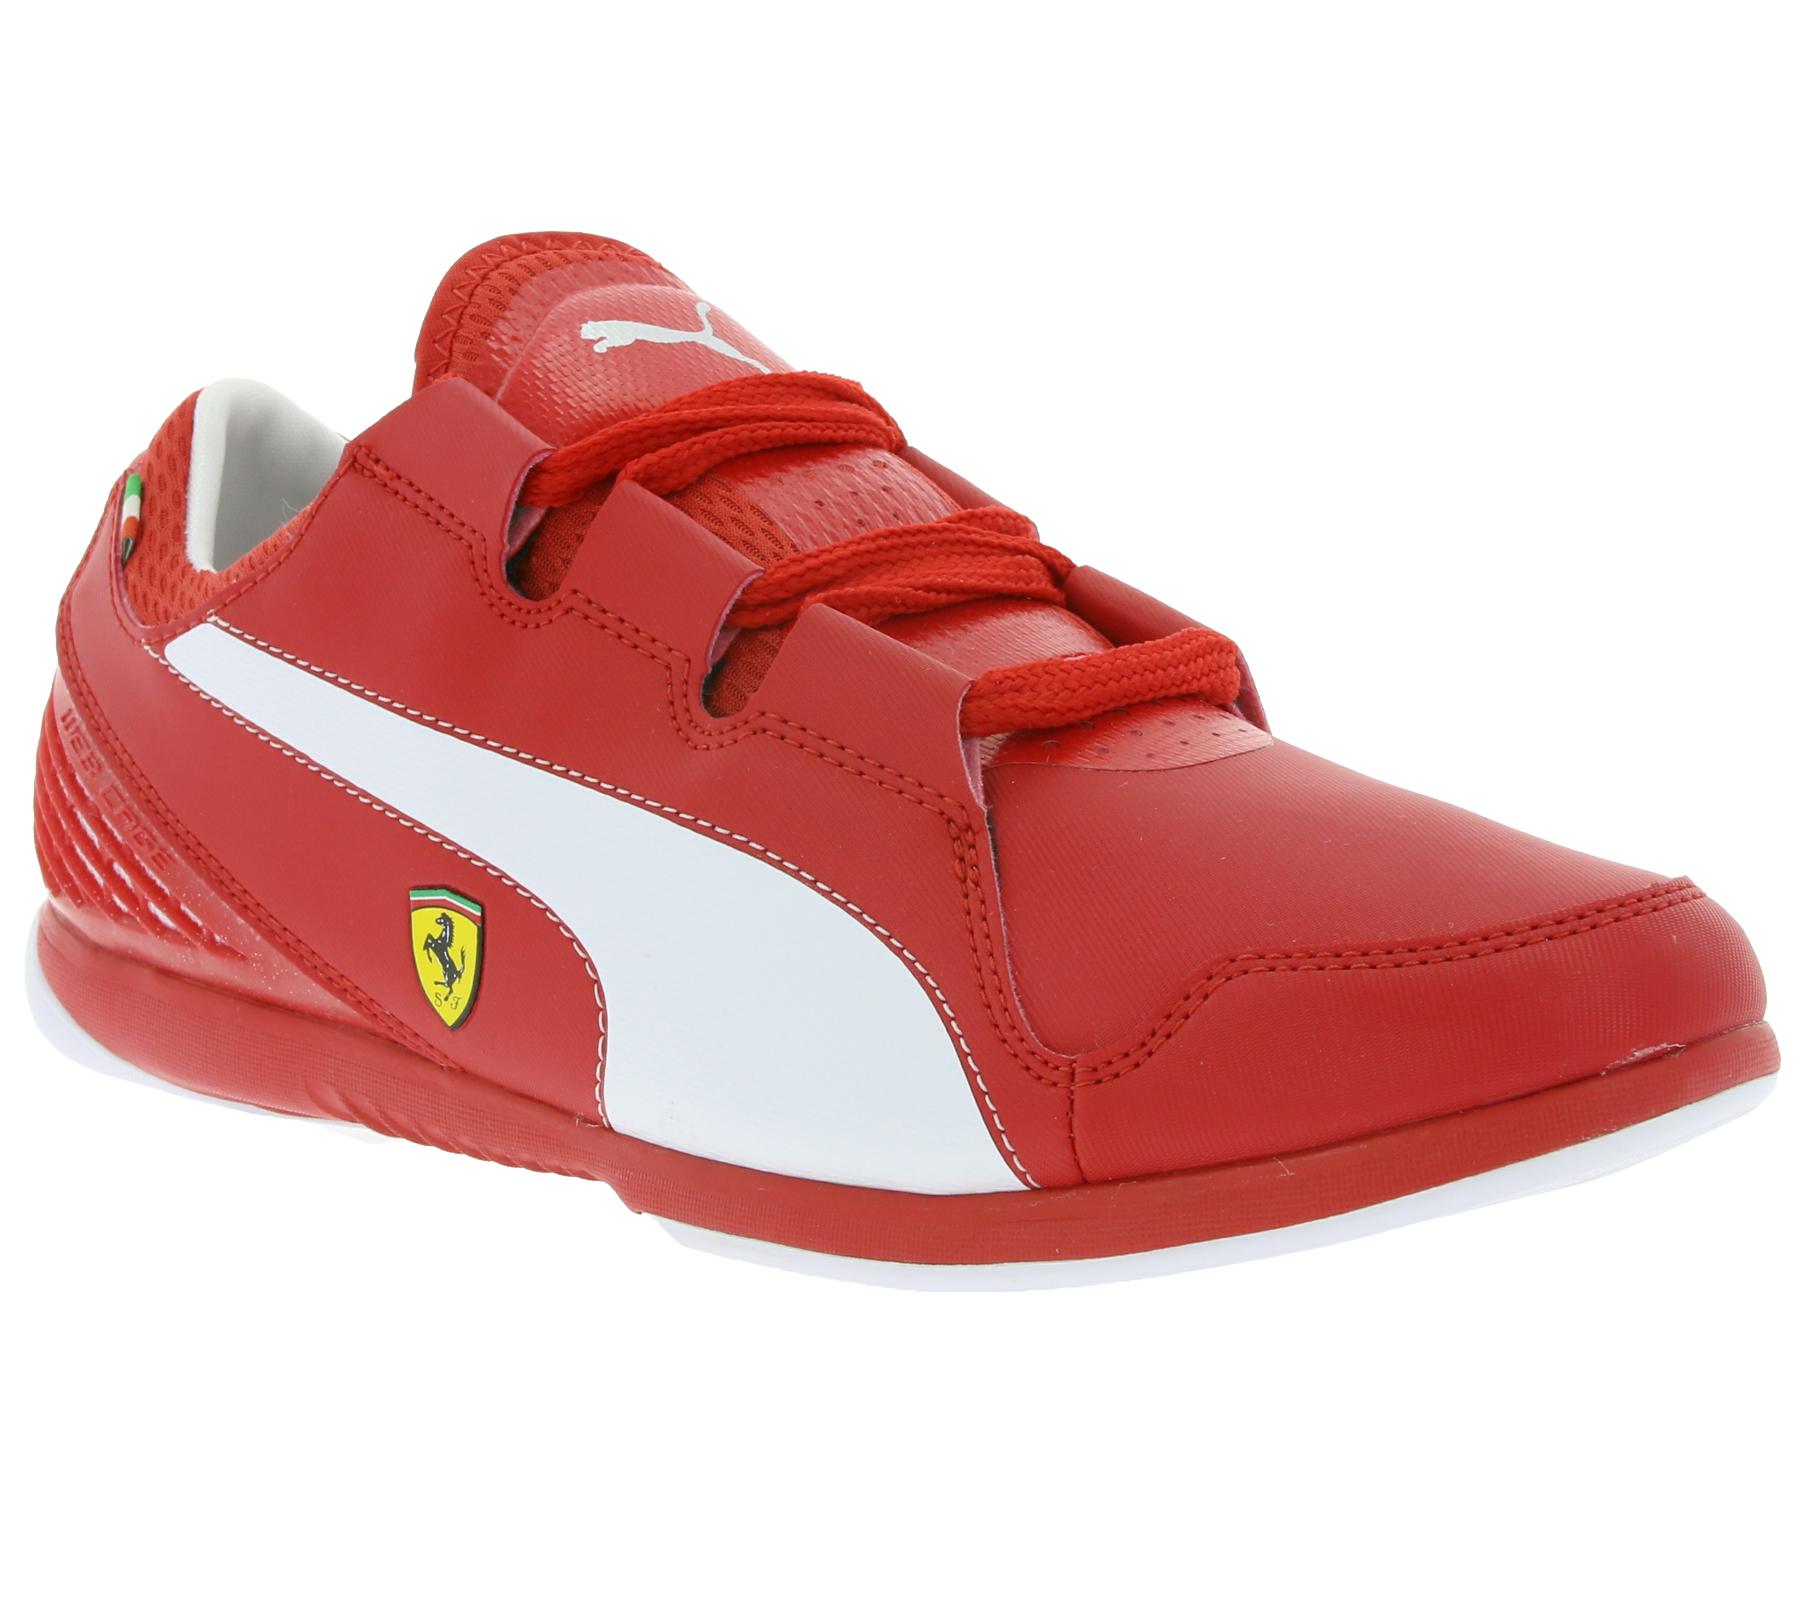 PUMA Valorosso Ferrari sneakers rood mtn 40 t/m 43 @ Outlet46.de